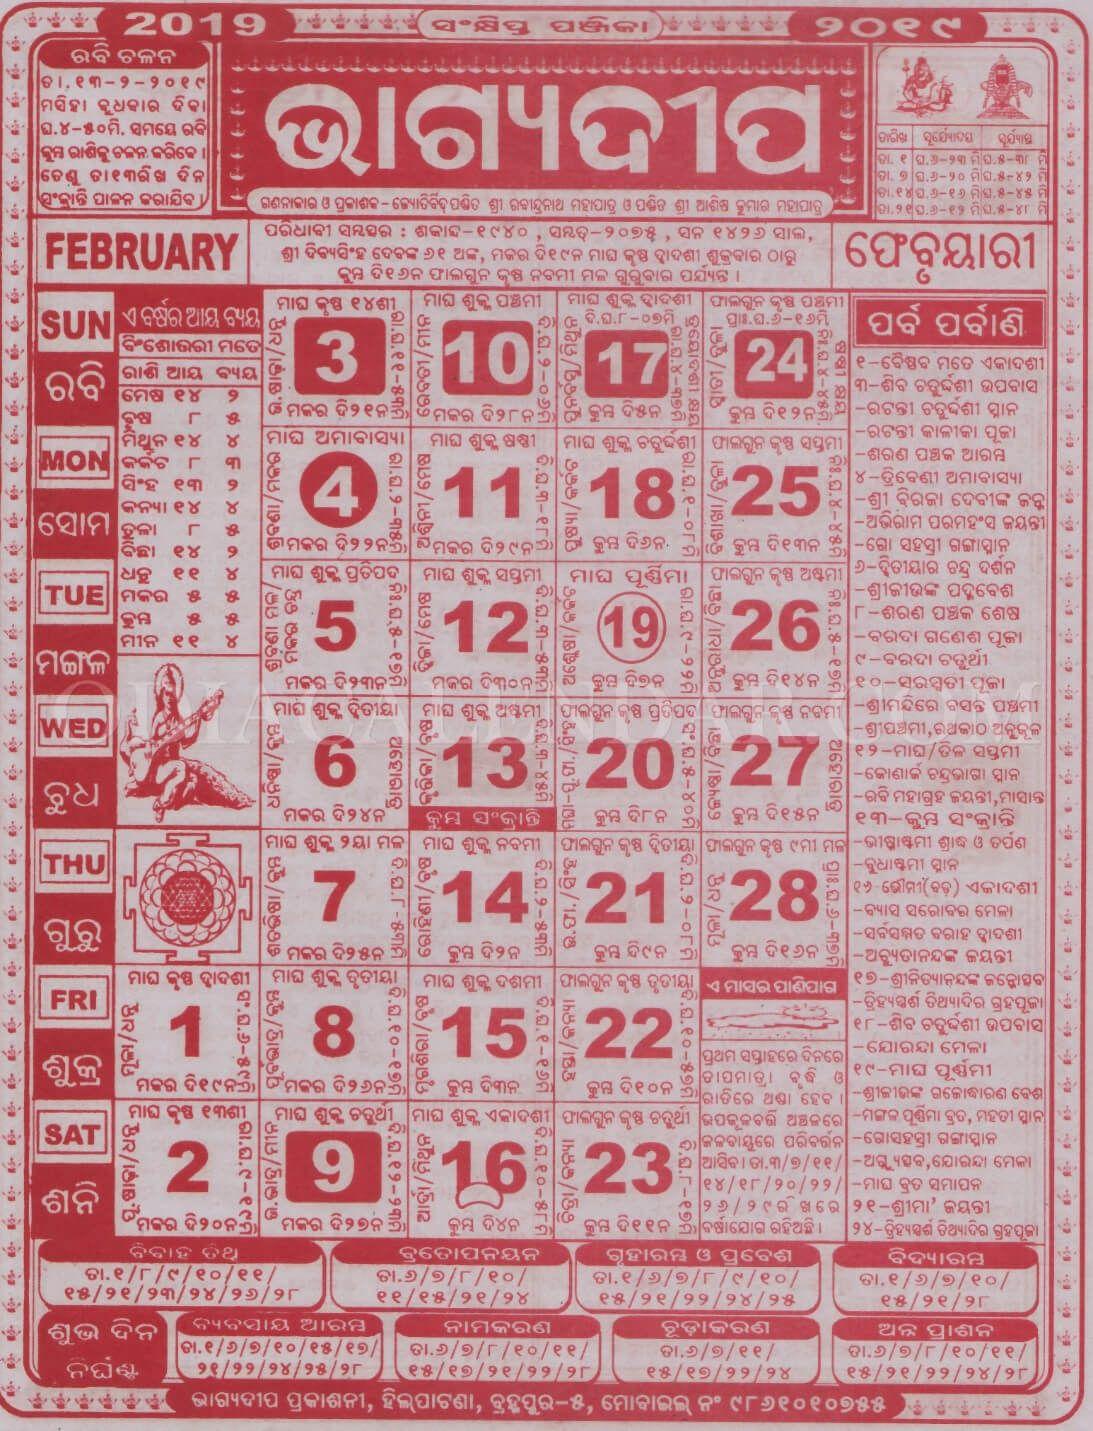 Bhagyadeep Calendar February 2019 | Calendar, February, High in Oriya Calendar 2020 February